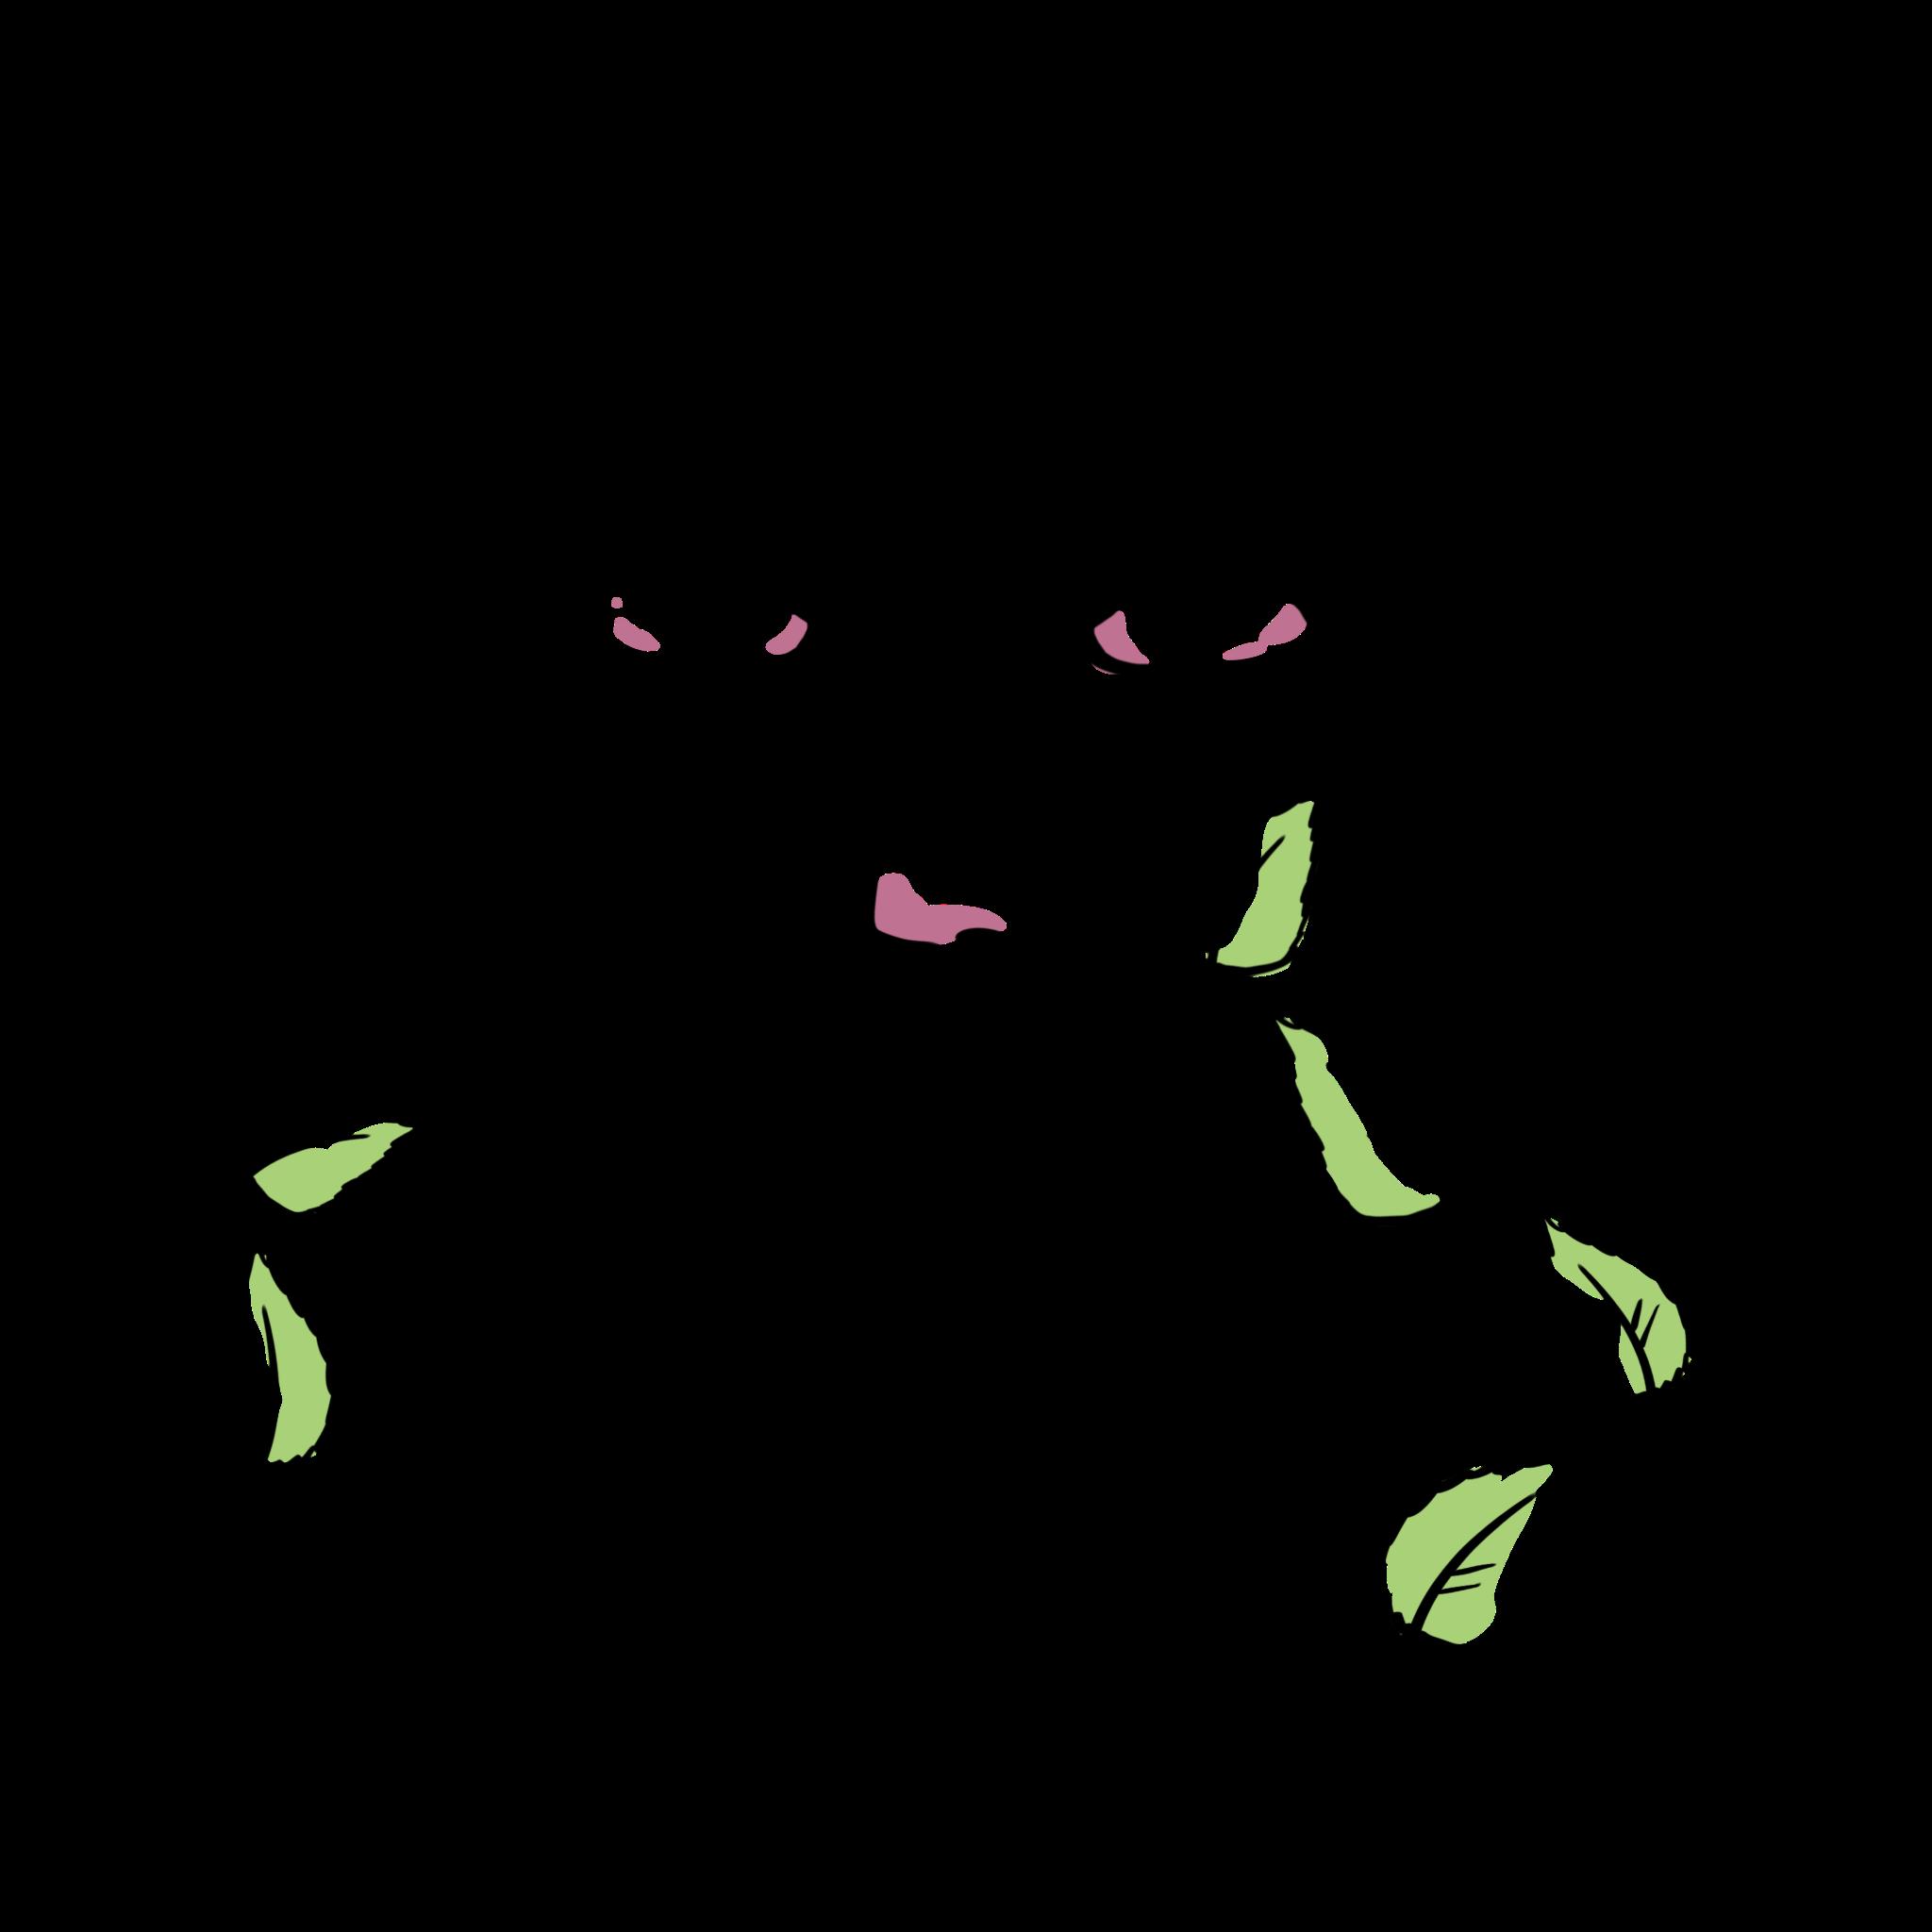 allergi-ock-astma-illustration-maja-larsson